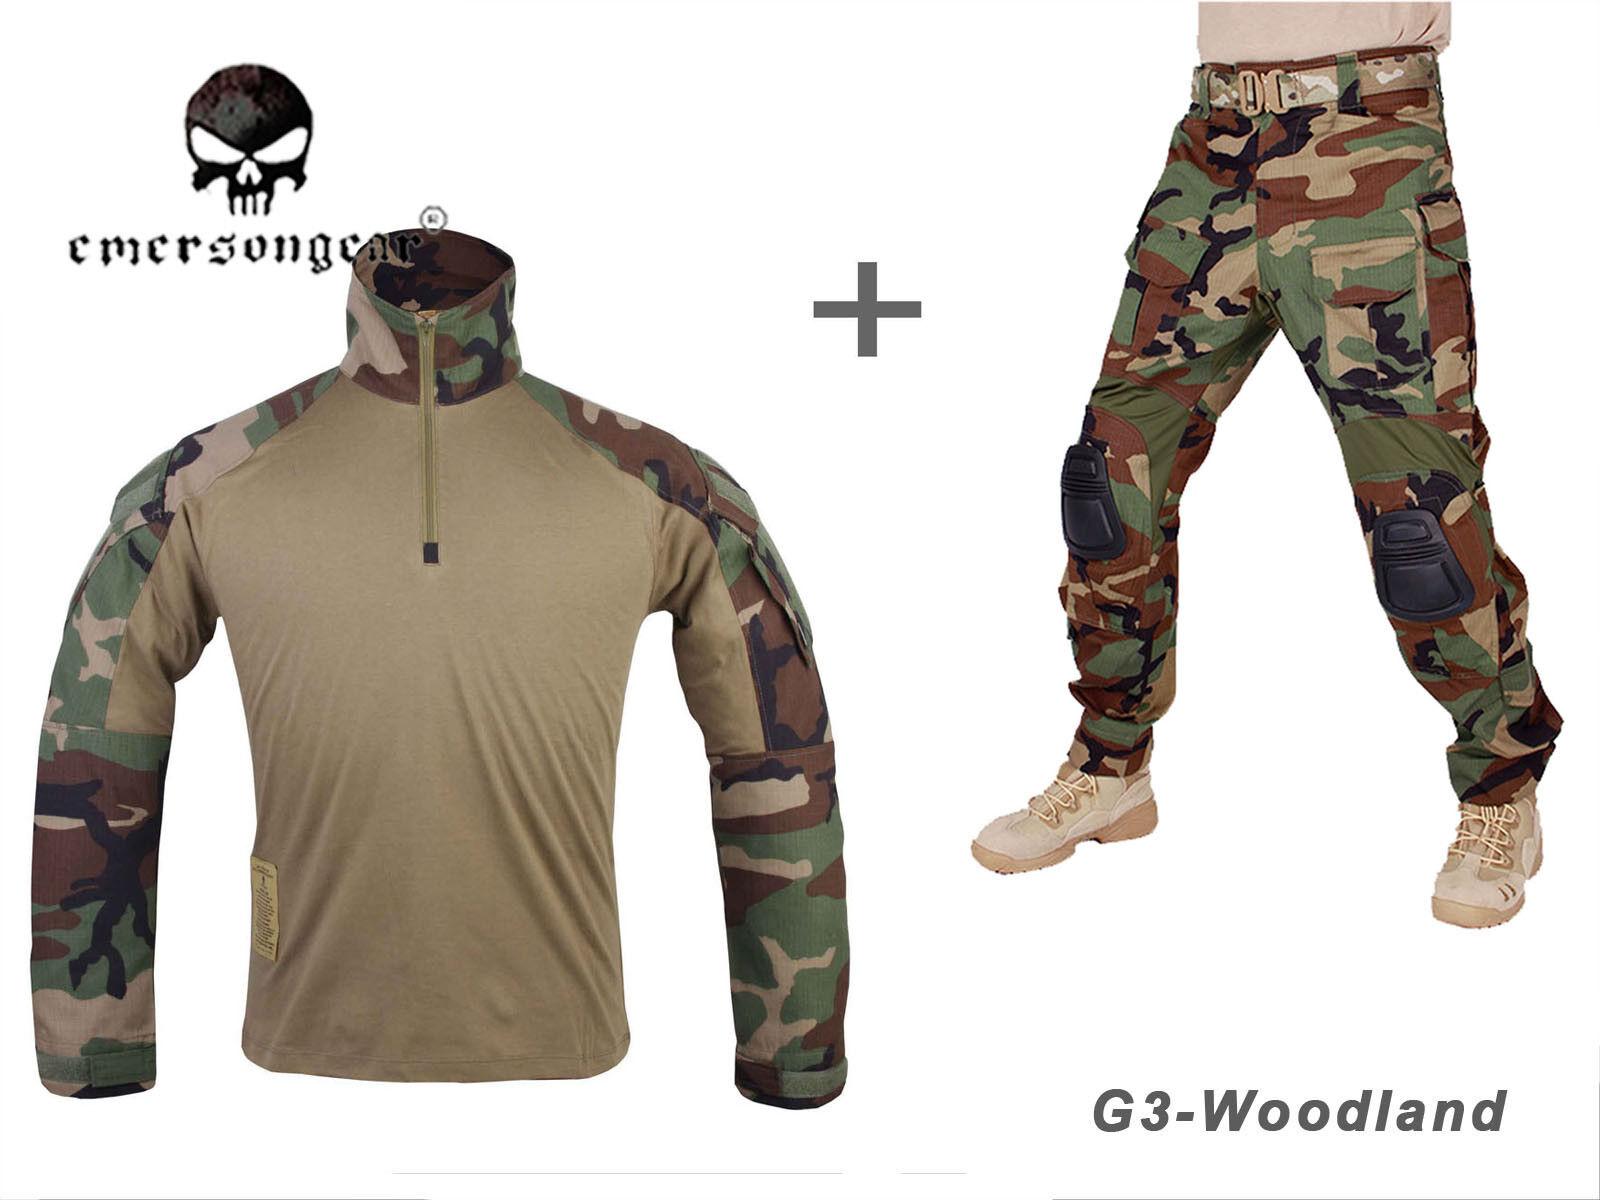 Airsoft Army Tactical Uniform Emerson Combat G3 Uniform Shirt Pants Woodland